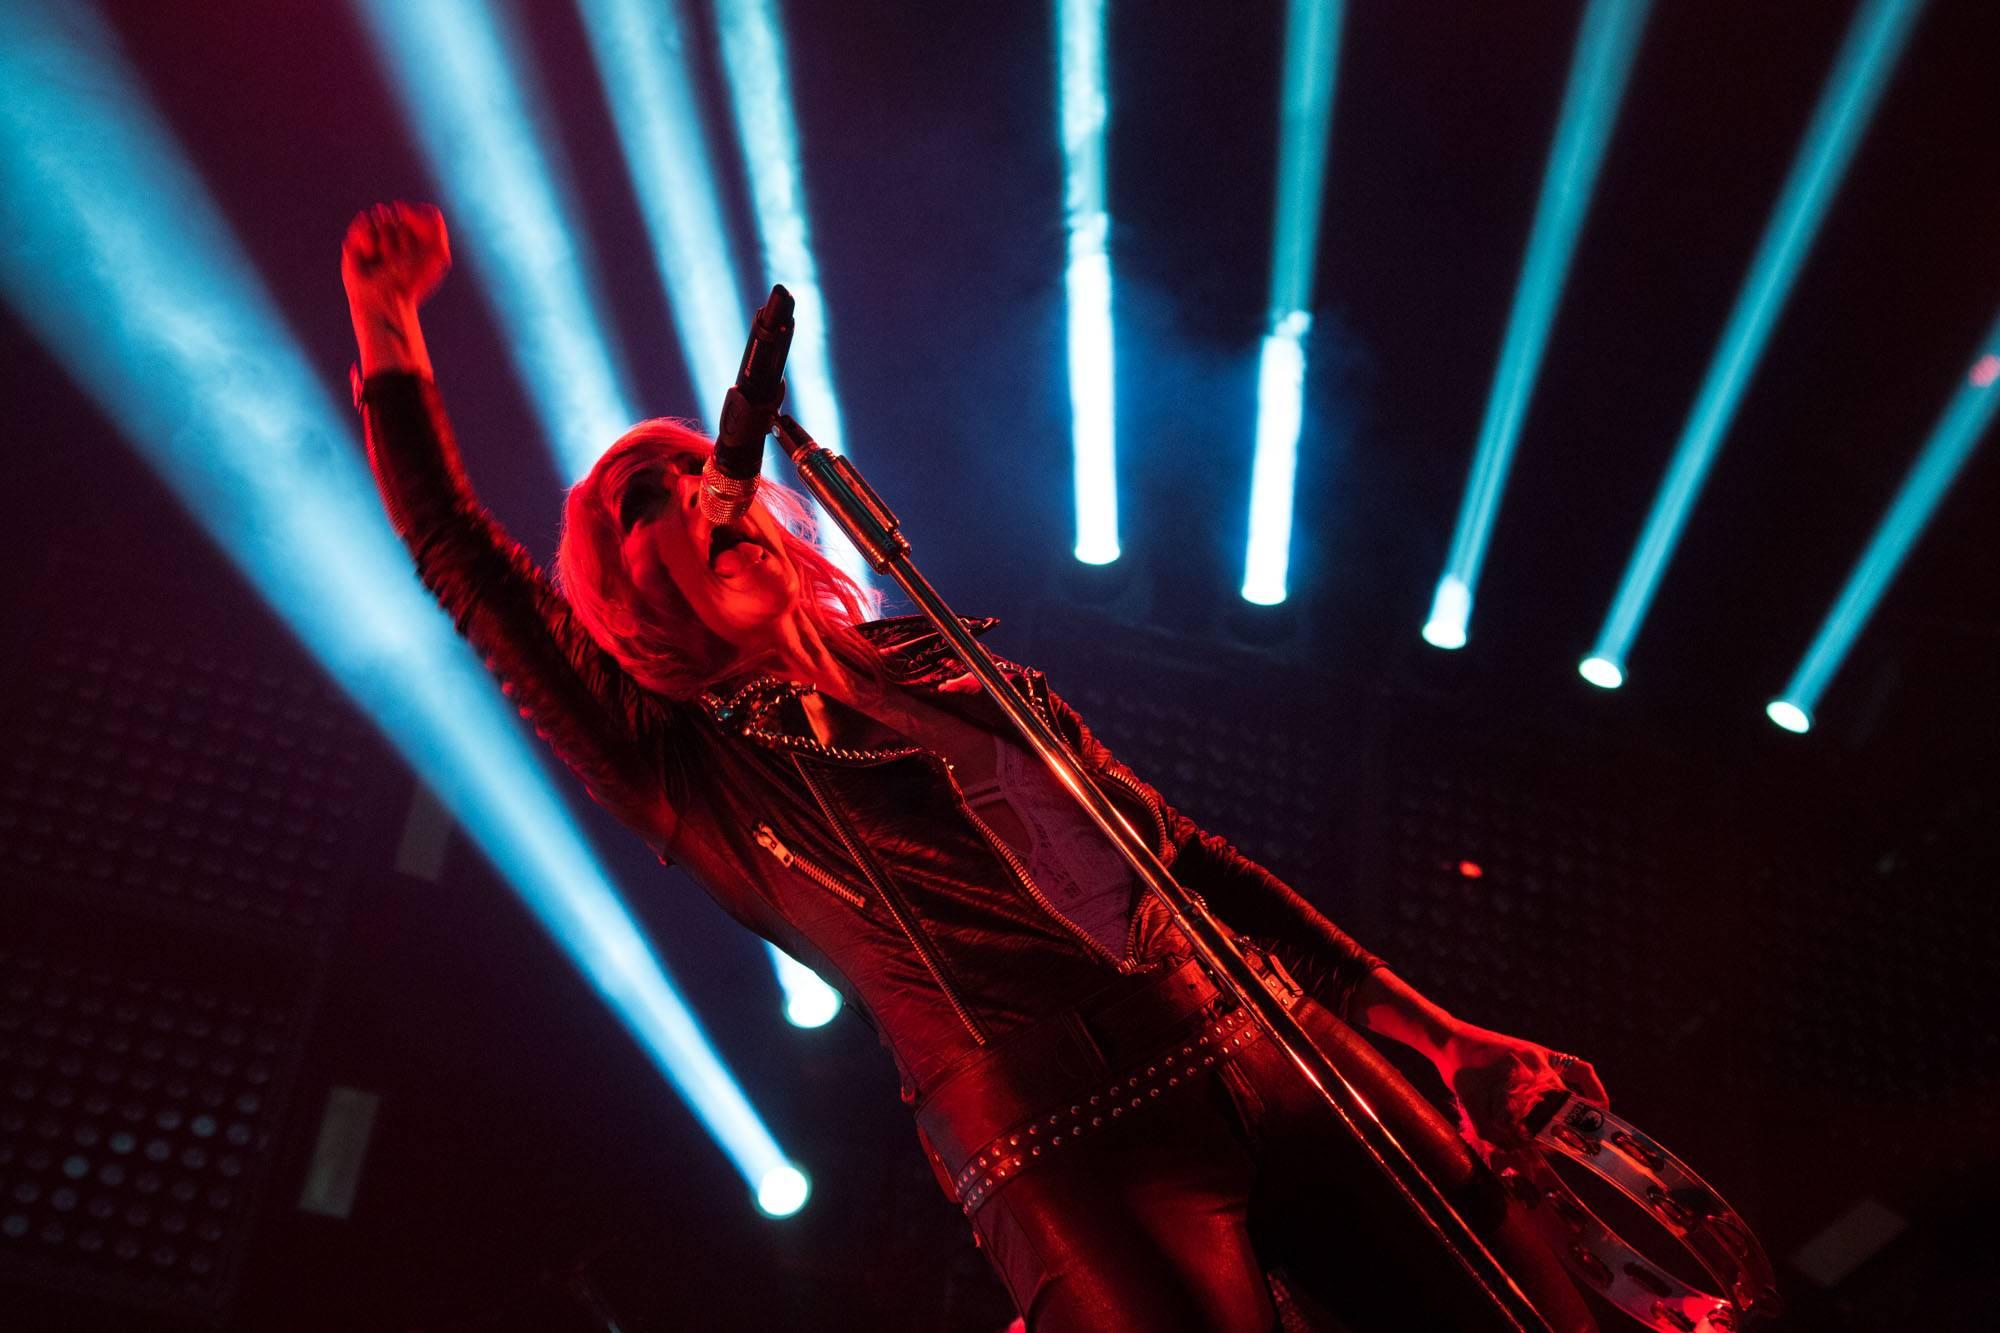 Metric at the Thunderbird Arena, Vancouver, Apr. 1 2016. Kirk Chantraine photo.